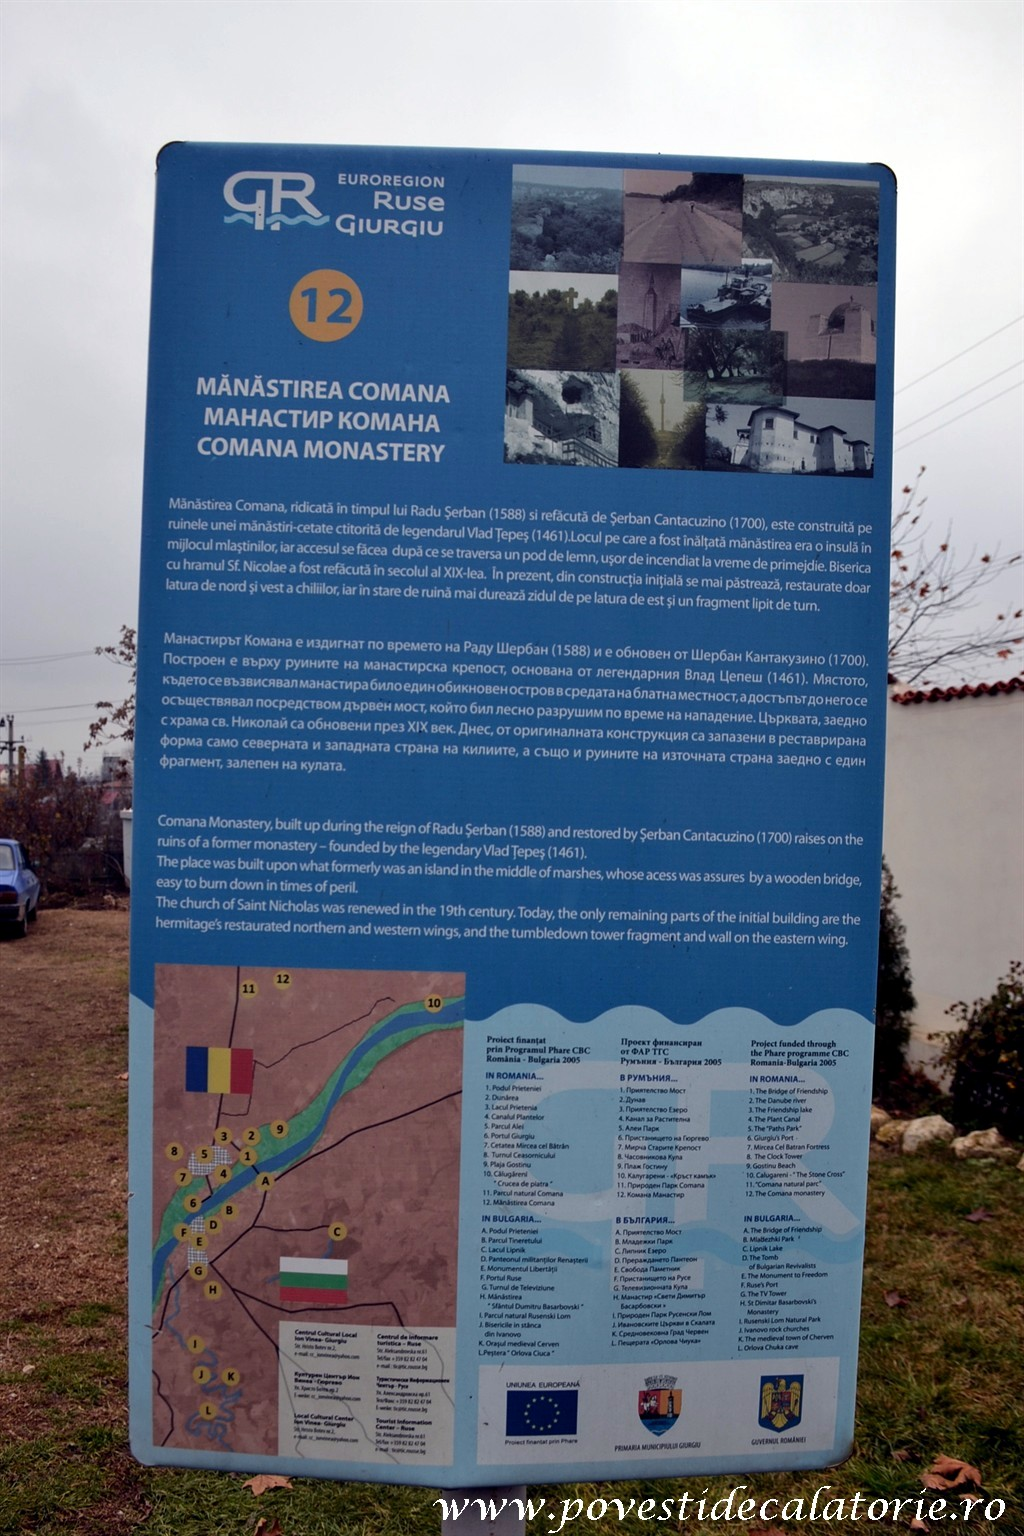 Manastirea Comana (11)